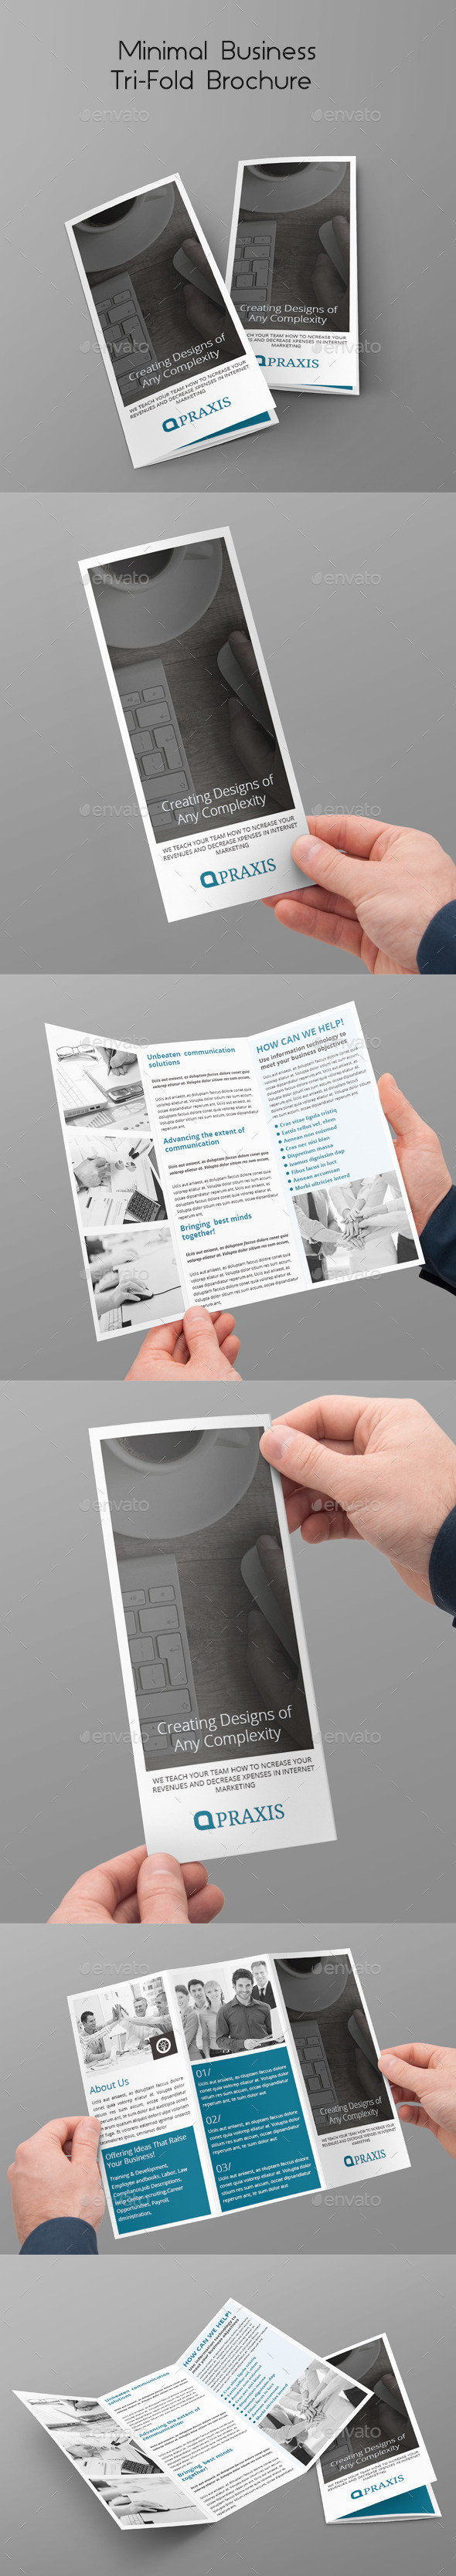 Minimal Business Tri-Fold Brochure - Corporate Brochures